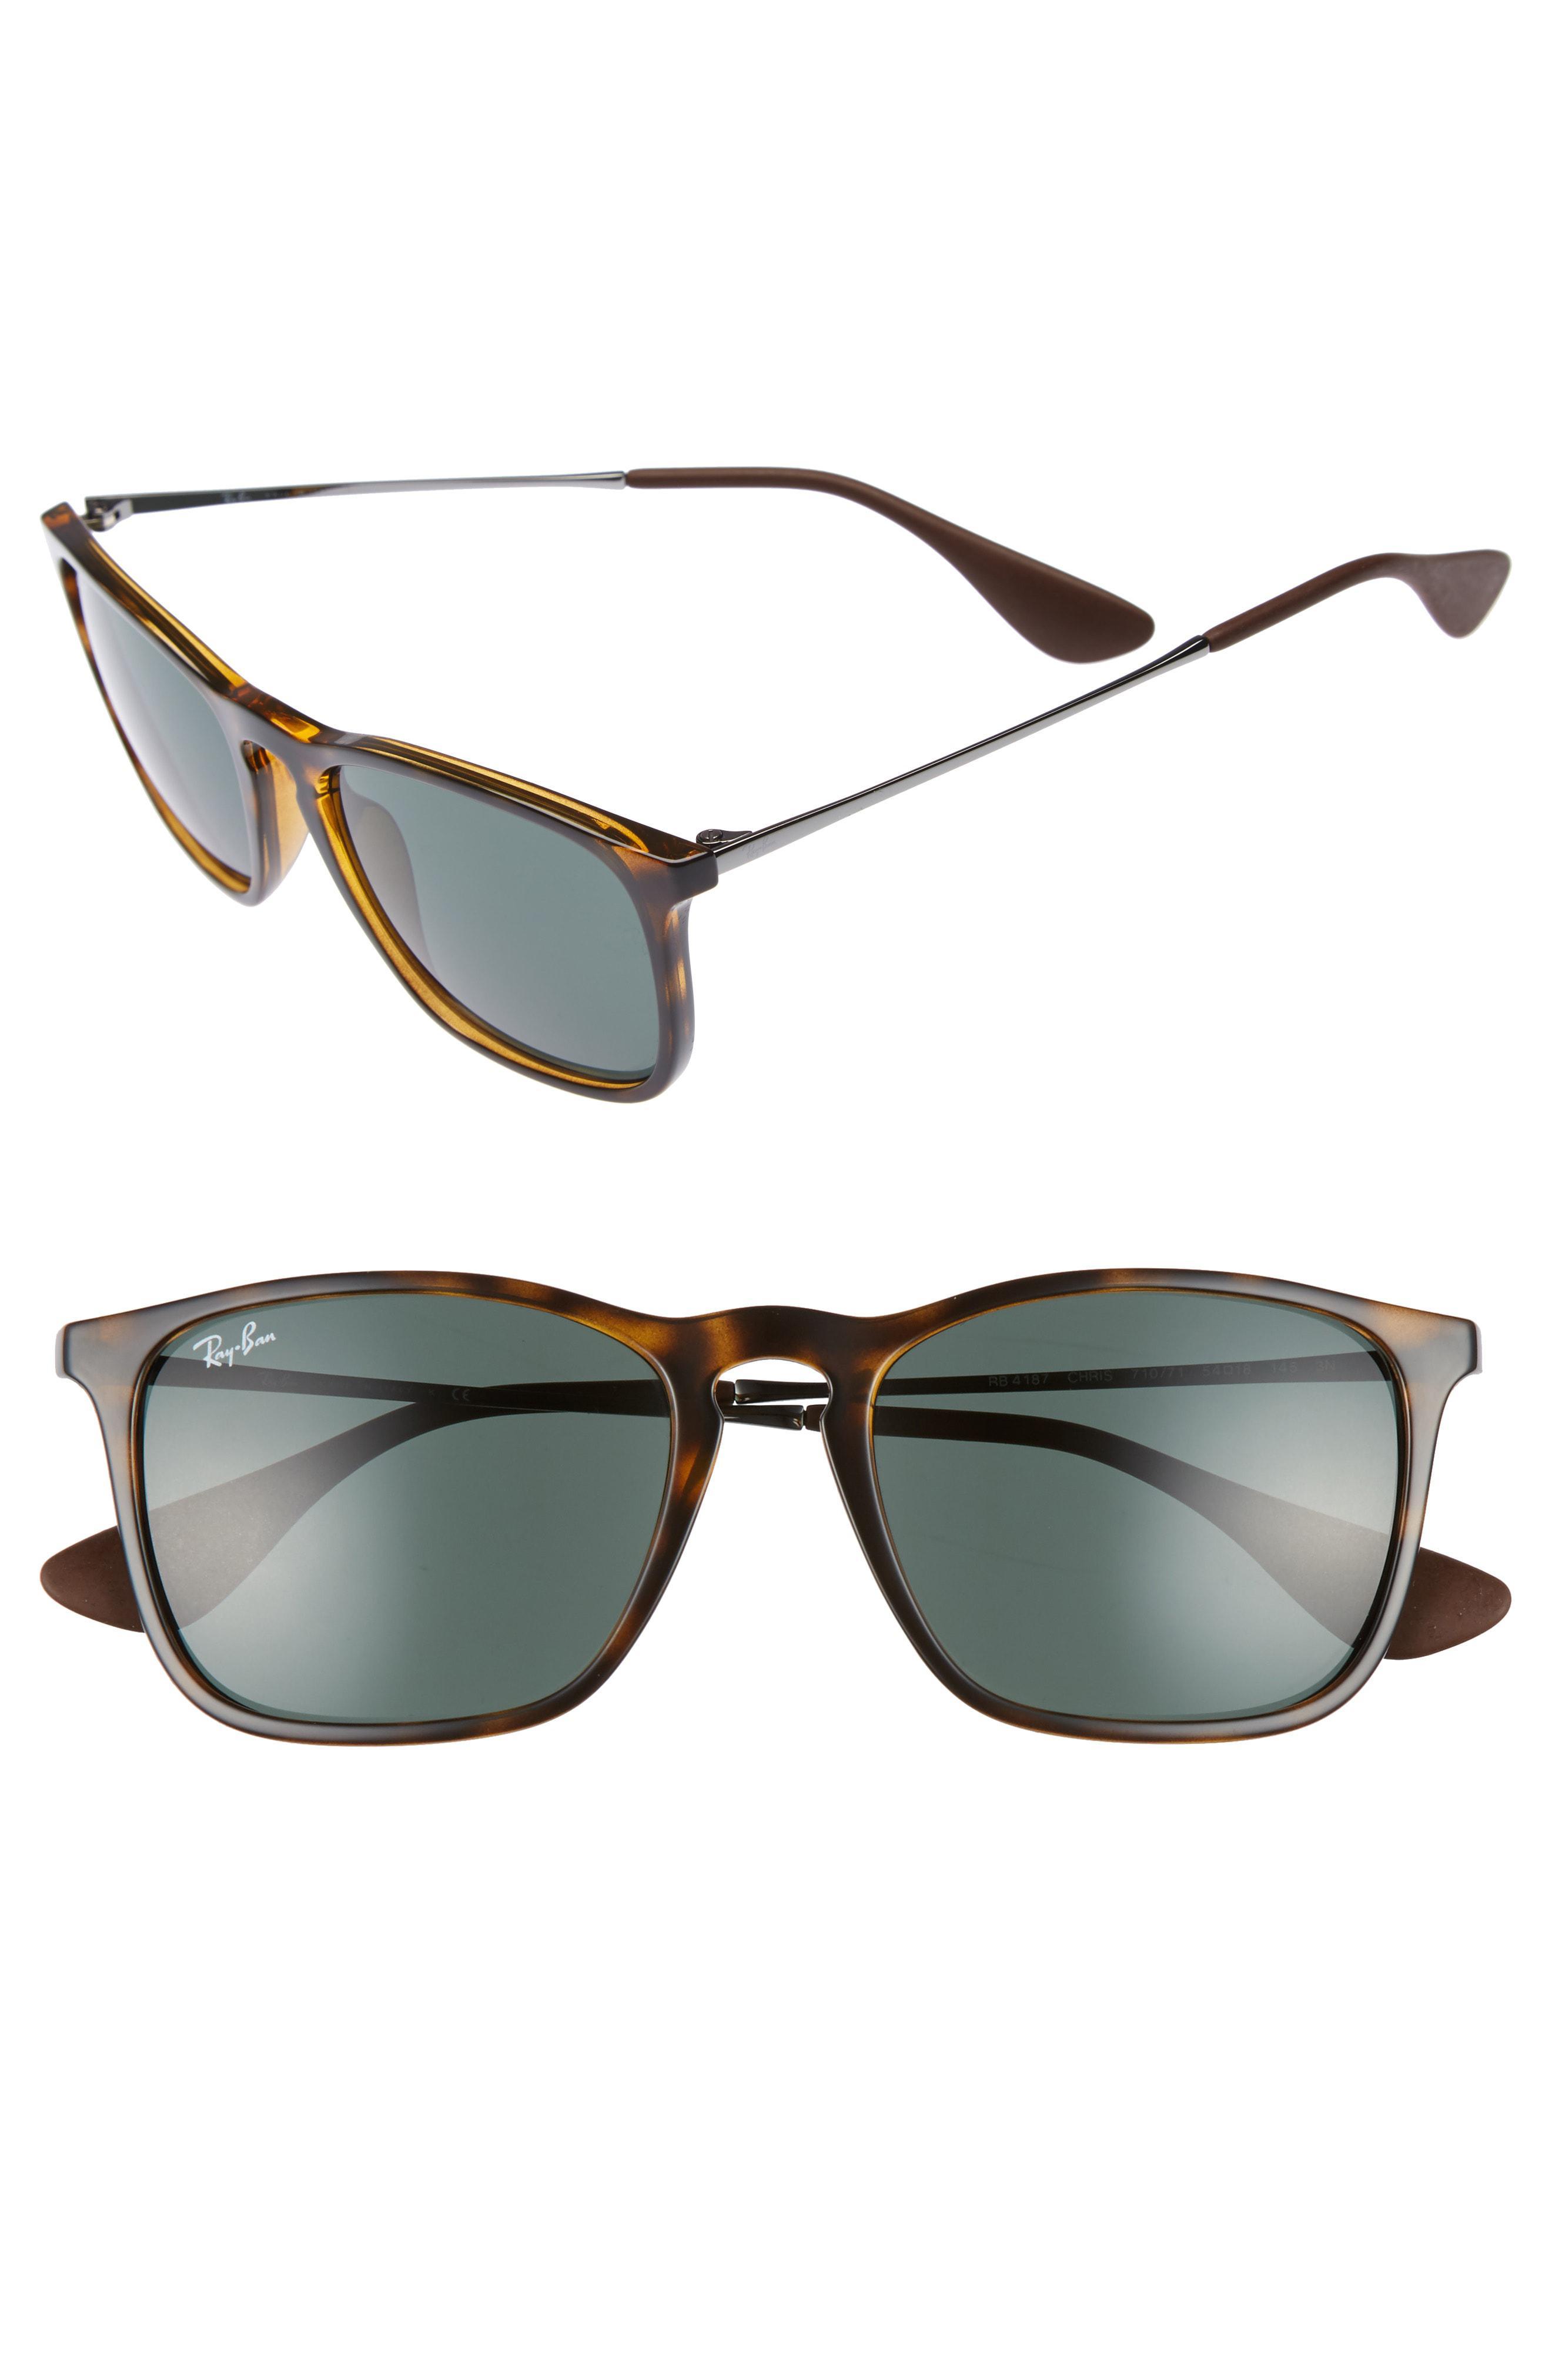 c5c6abf22de Lyst - Ray-Ban 54mm Sunglasses - Light Havana in Gray for Men